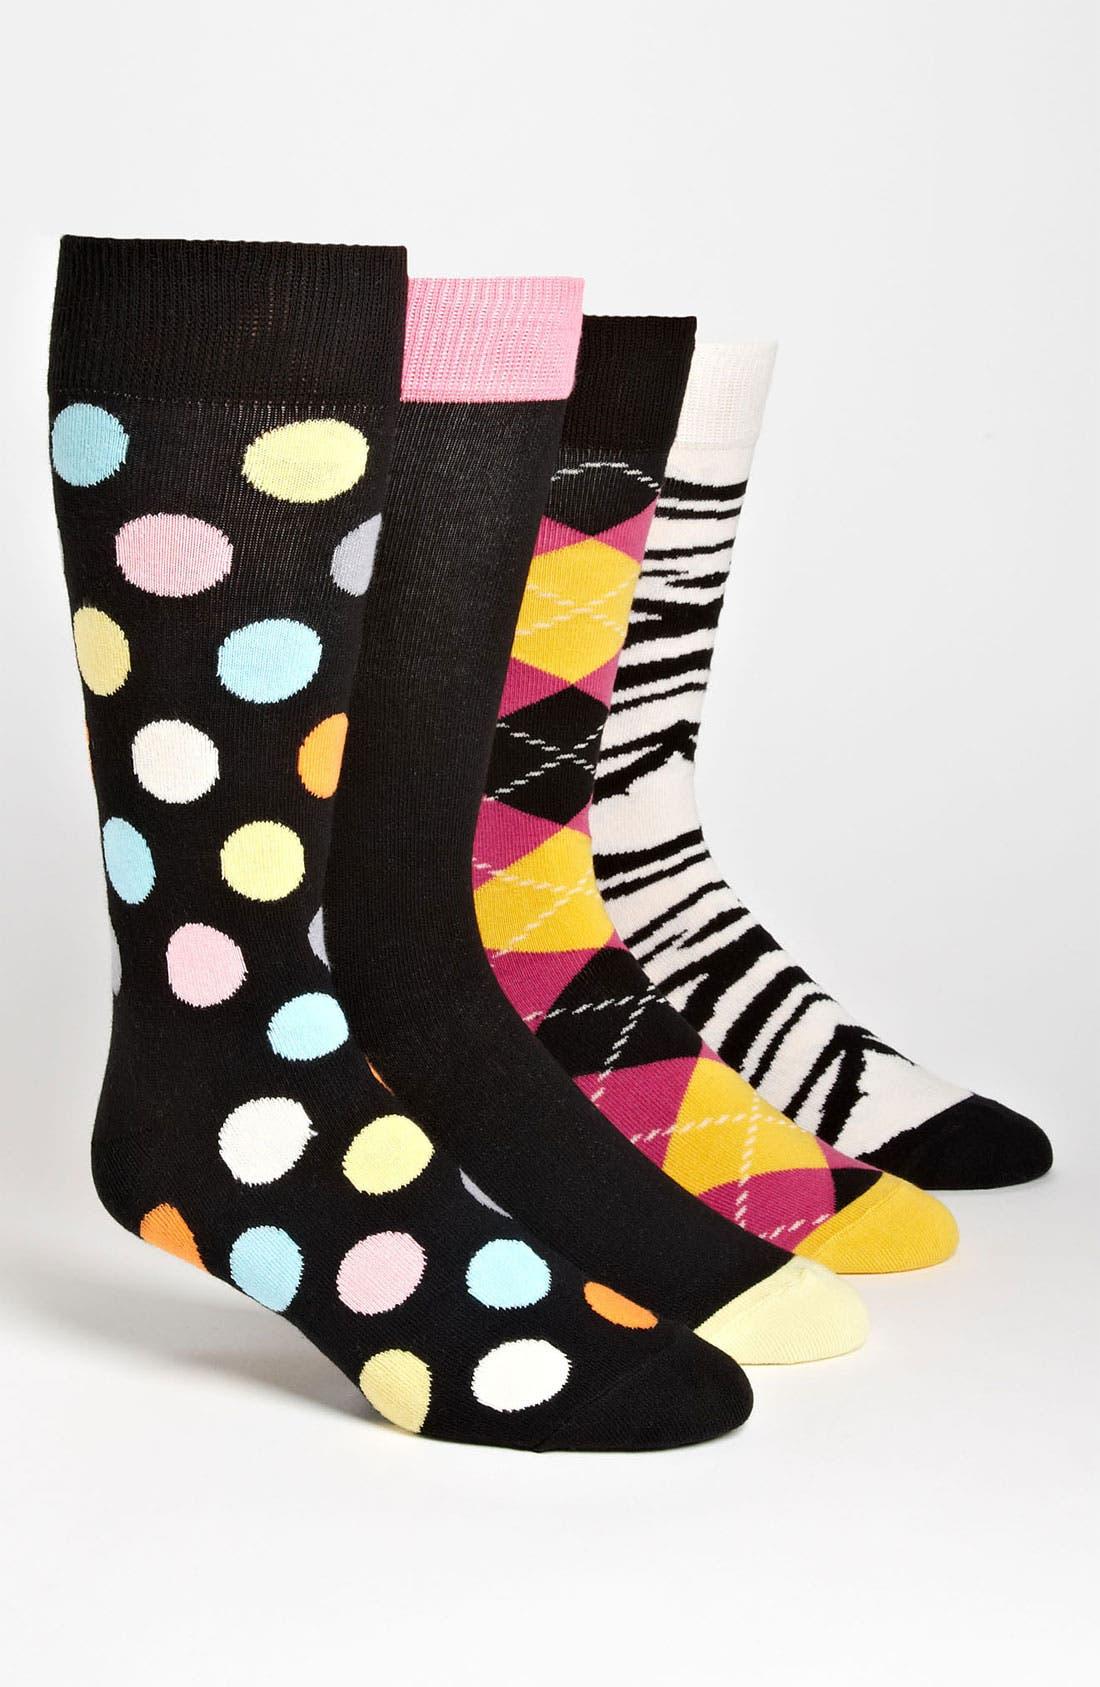 Main Image - Happy Socks Cotton Blend Sock Set (4-Pack)